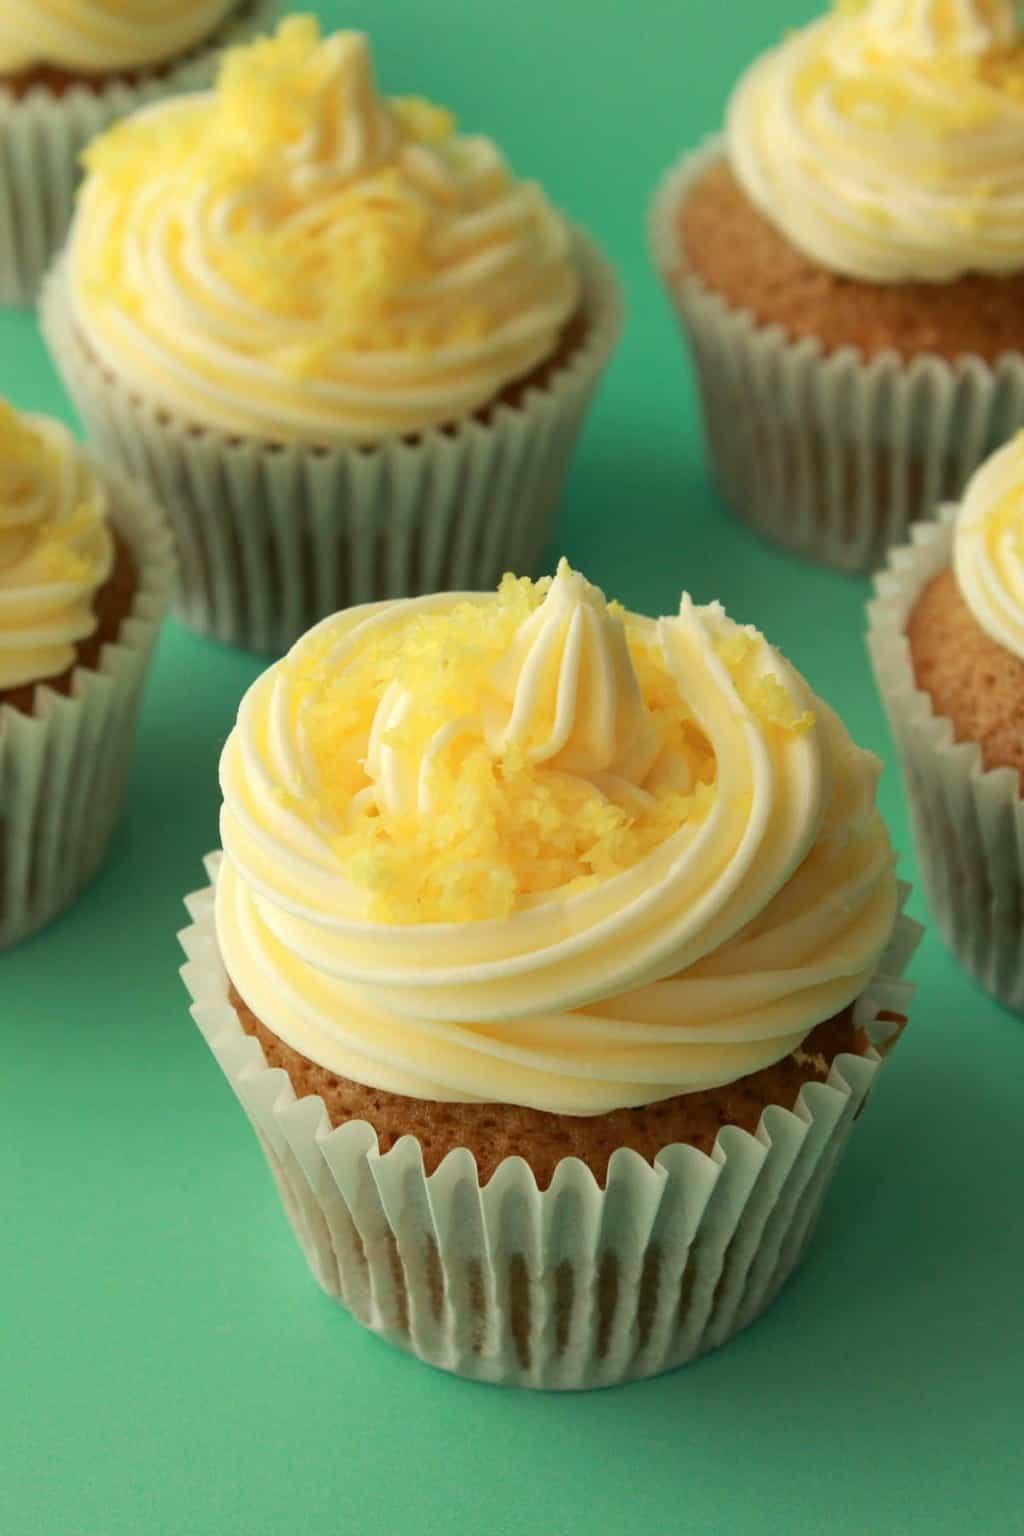 Vegan Lemon Cupcakes with Lemon Buttercream Frosting. #vegan #lovingitvegan #cupcakes #dessert